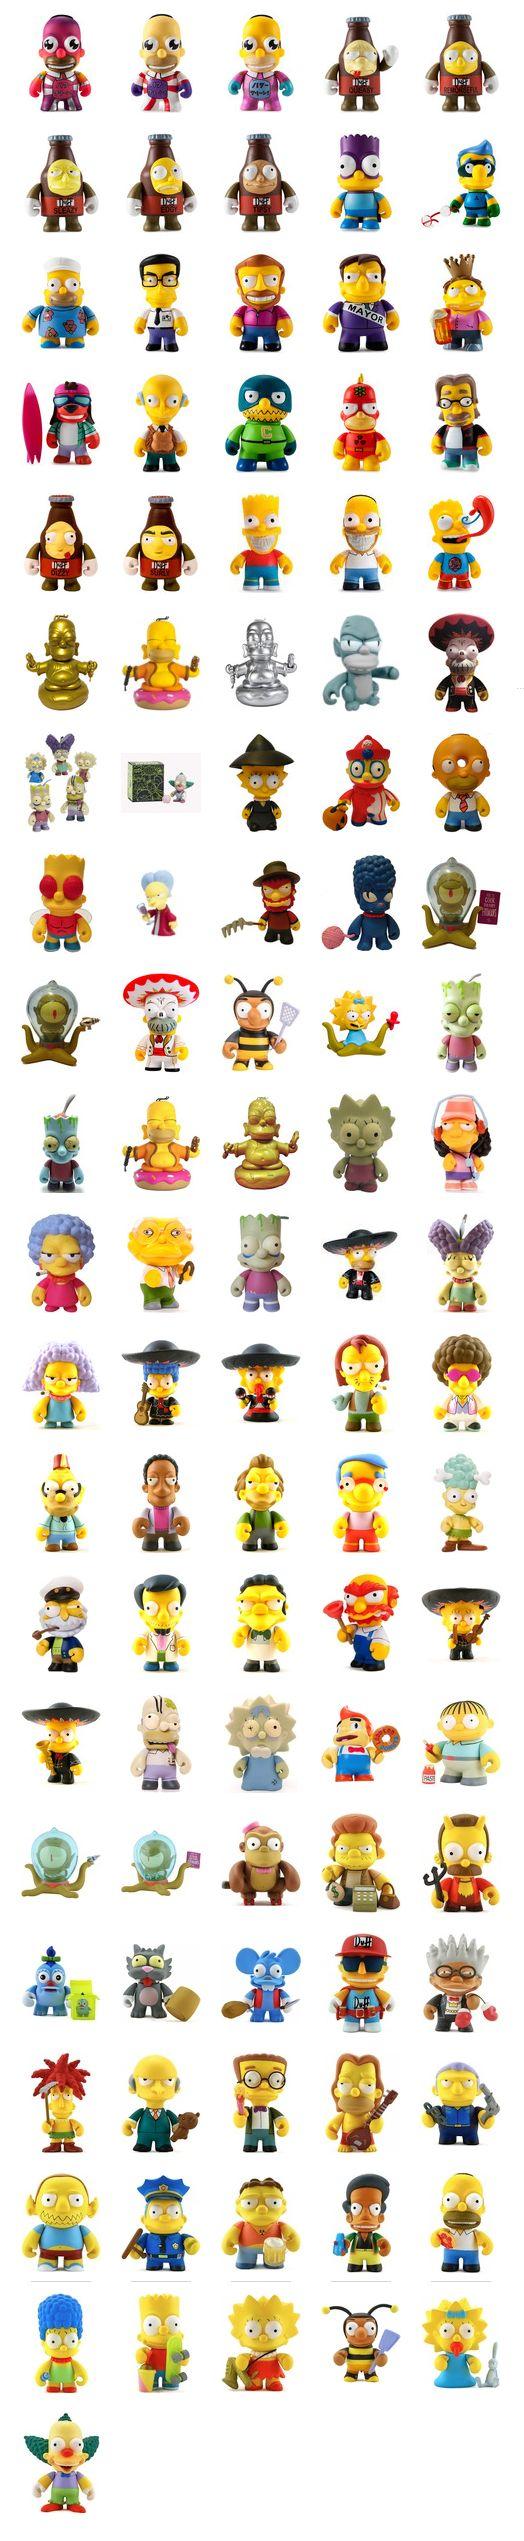 Kidrobot Simpsons